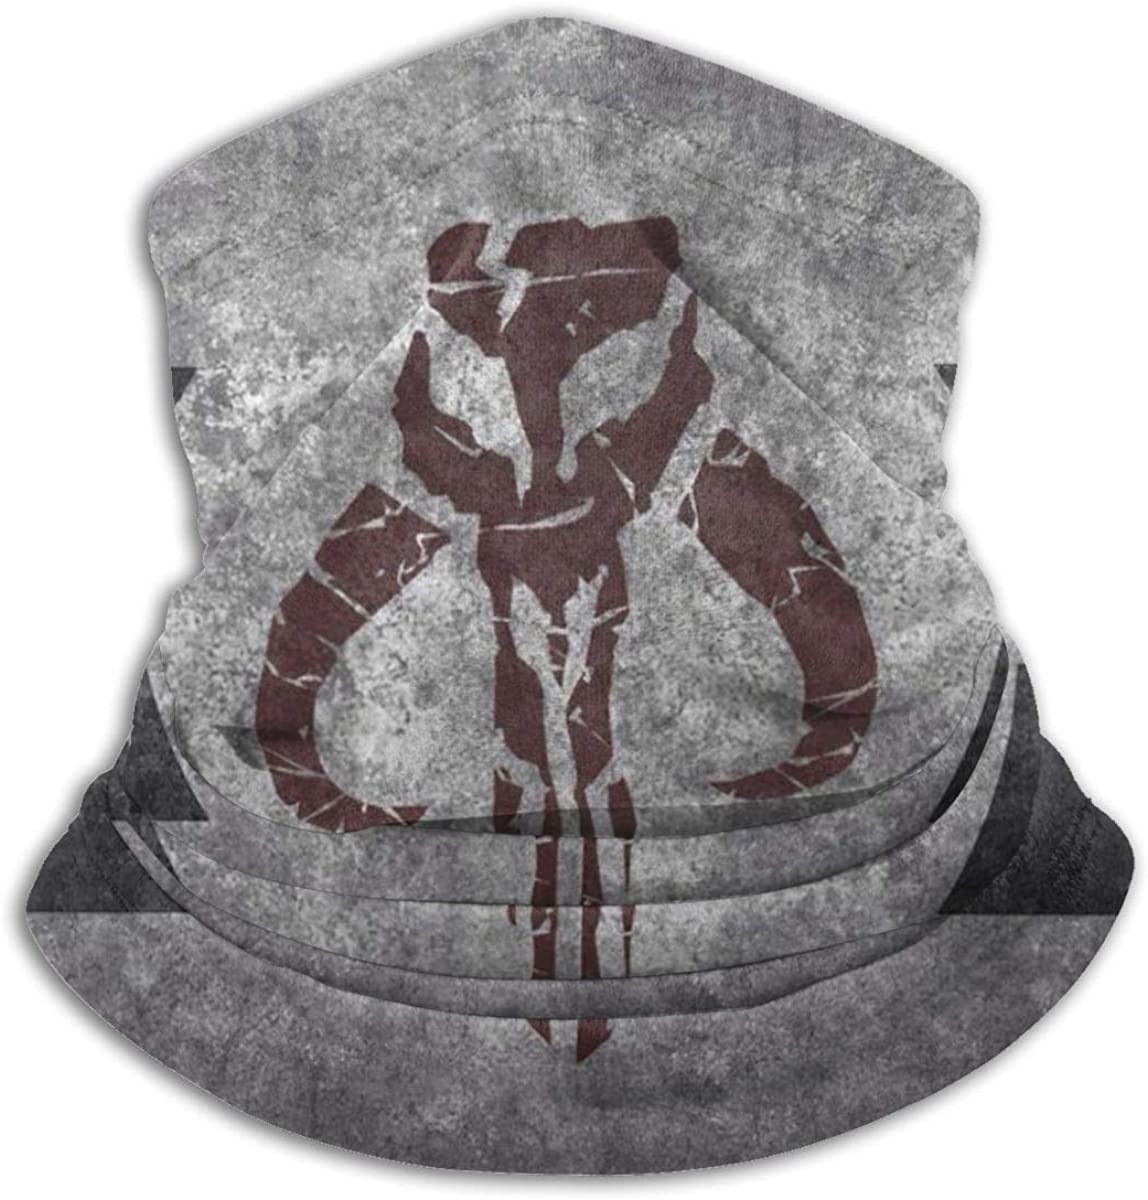 Neck Gaiter Balaclava Windproof Bandana Headwear Face Cover Bandanas for Men Women Sports Or Outdoors